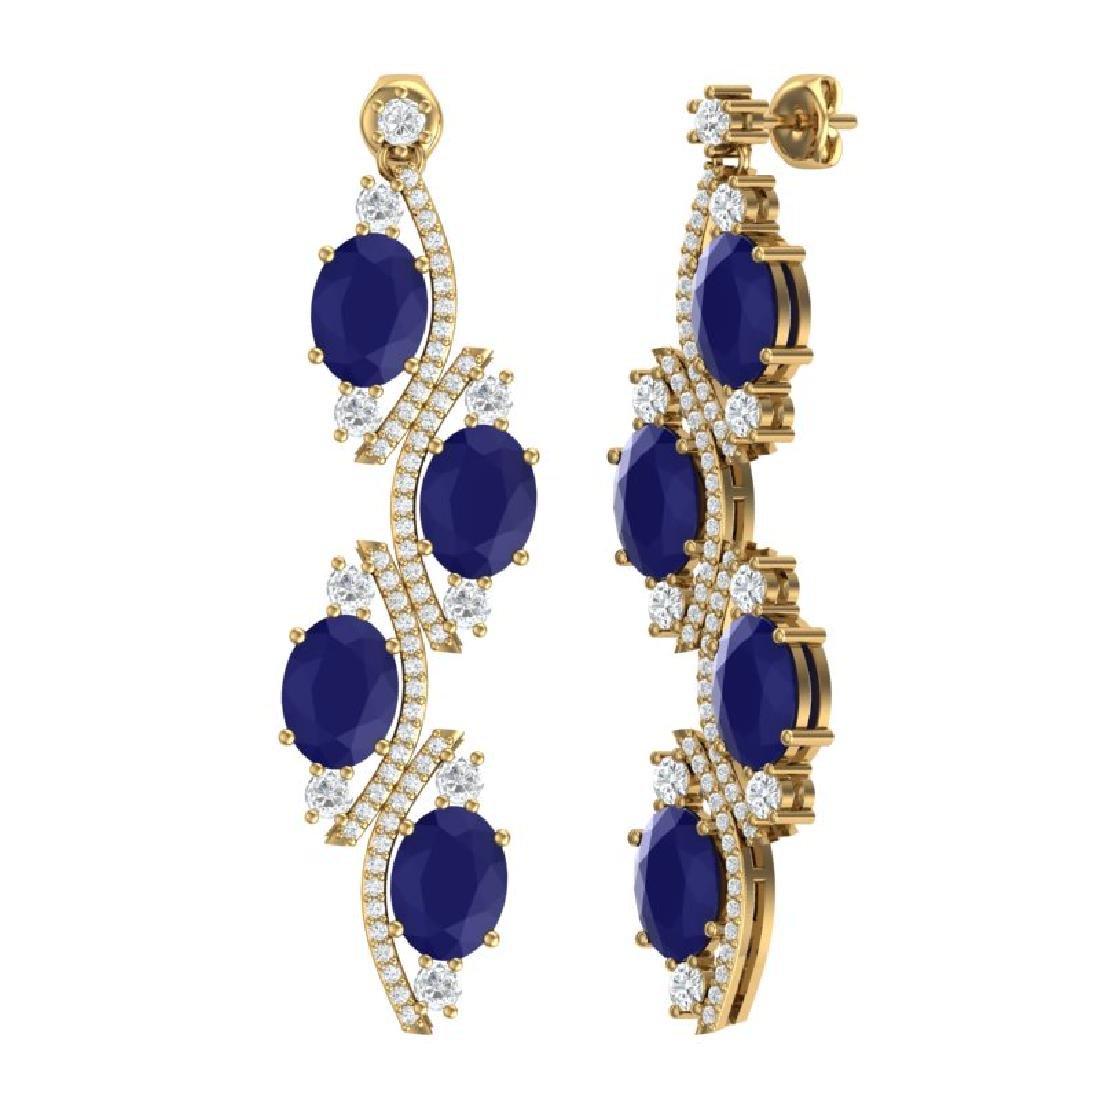 16.12 CTW Royalty Sapphire & VS Diamond Earrings 18K - 3